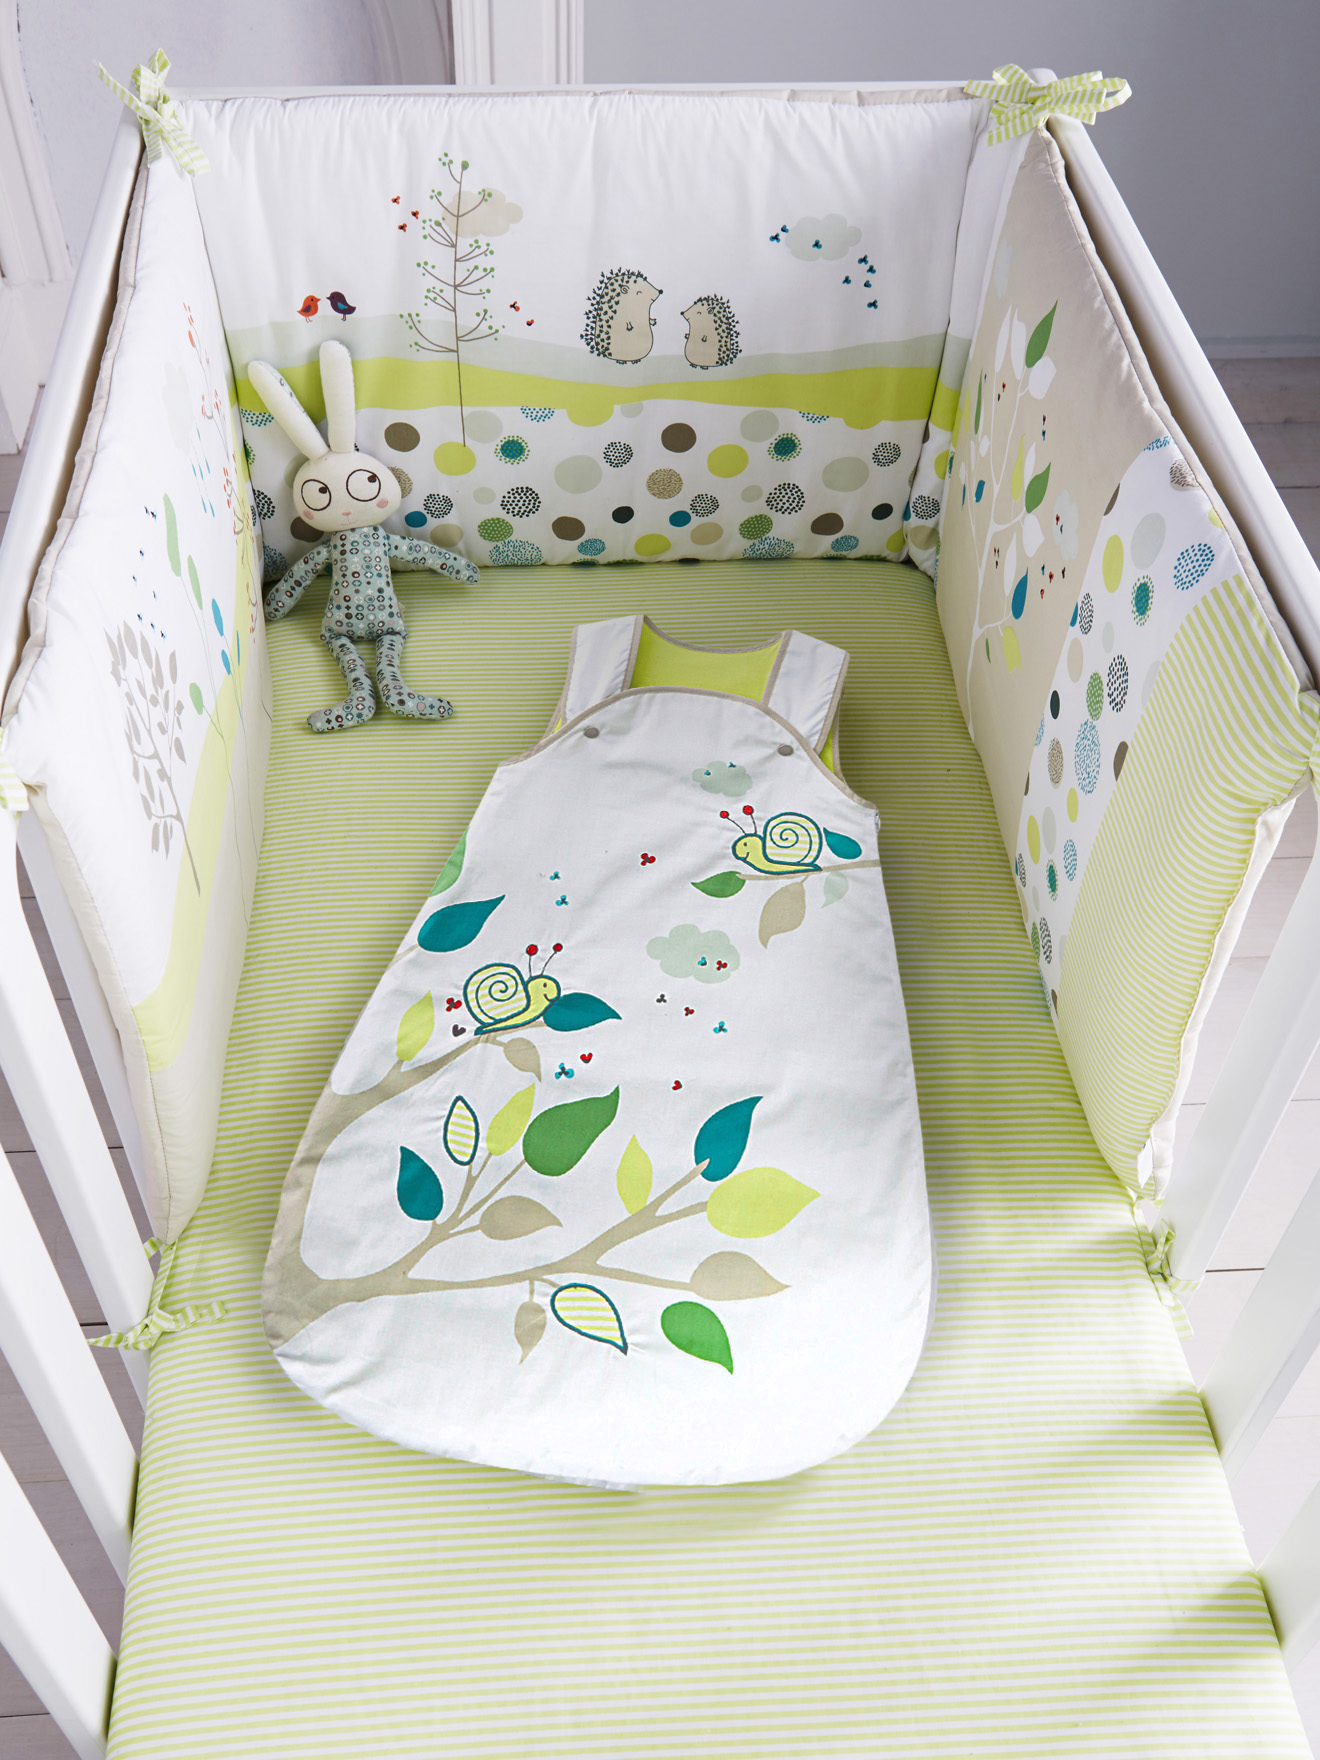 Tour de lit bébé brodé PIC-NIC vert - Vertbaudet